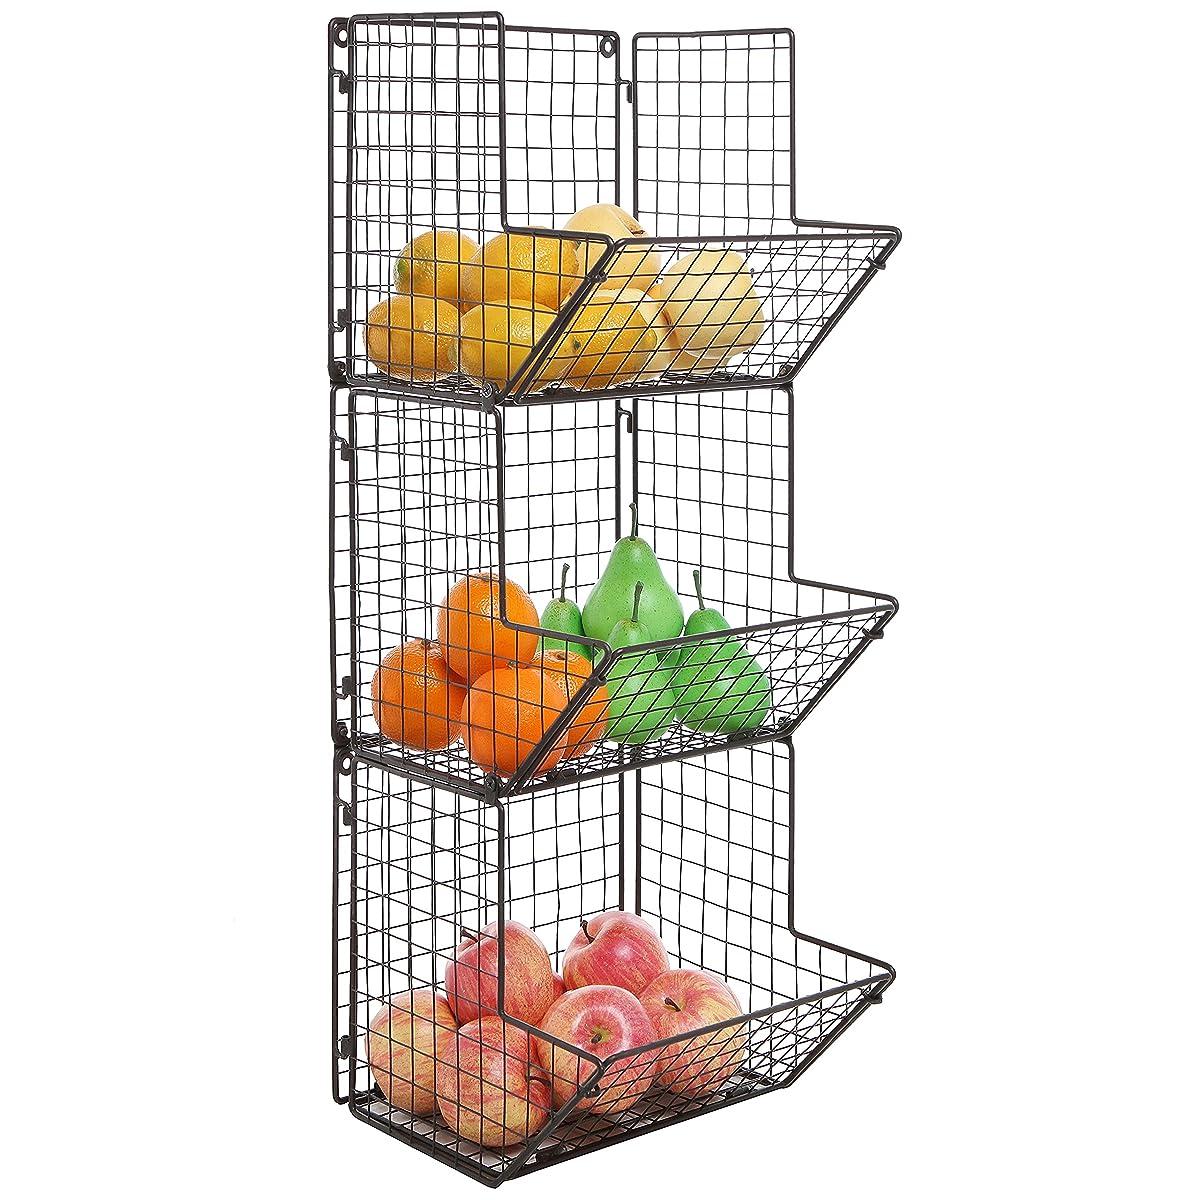 Rustic Brown Metal Wire 3 Tier Wall Mounted Kitchen Fruit Produce Bin Rack / Bathroom Towel Baskets